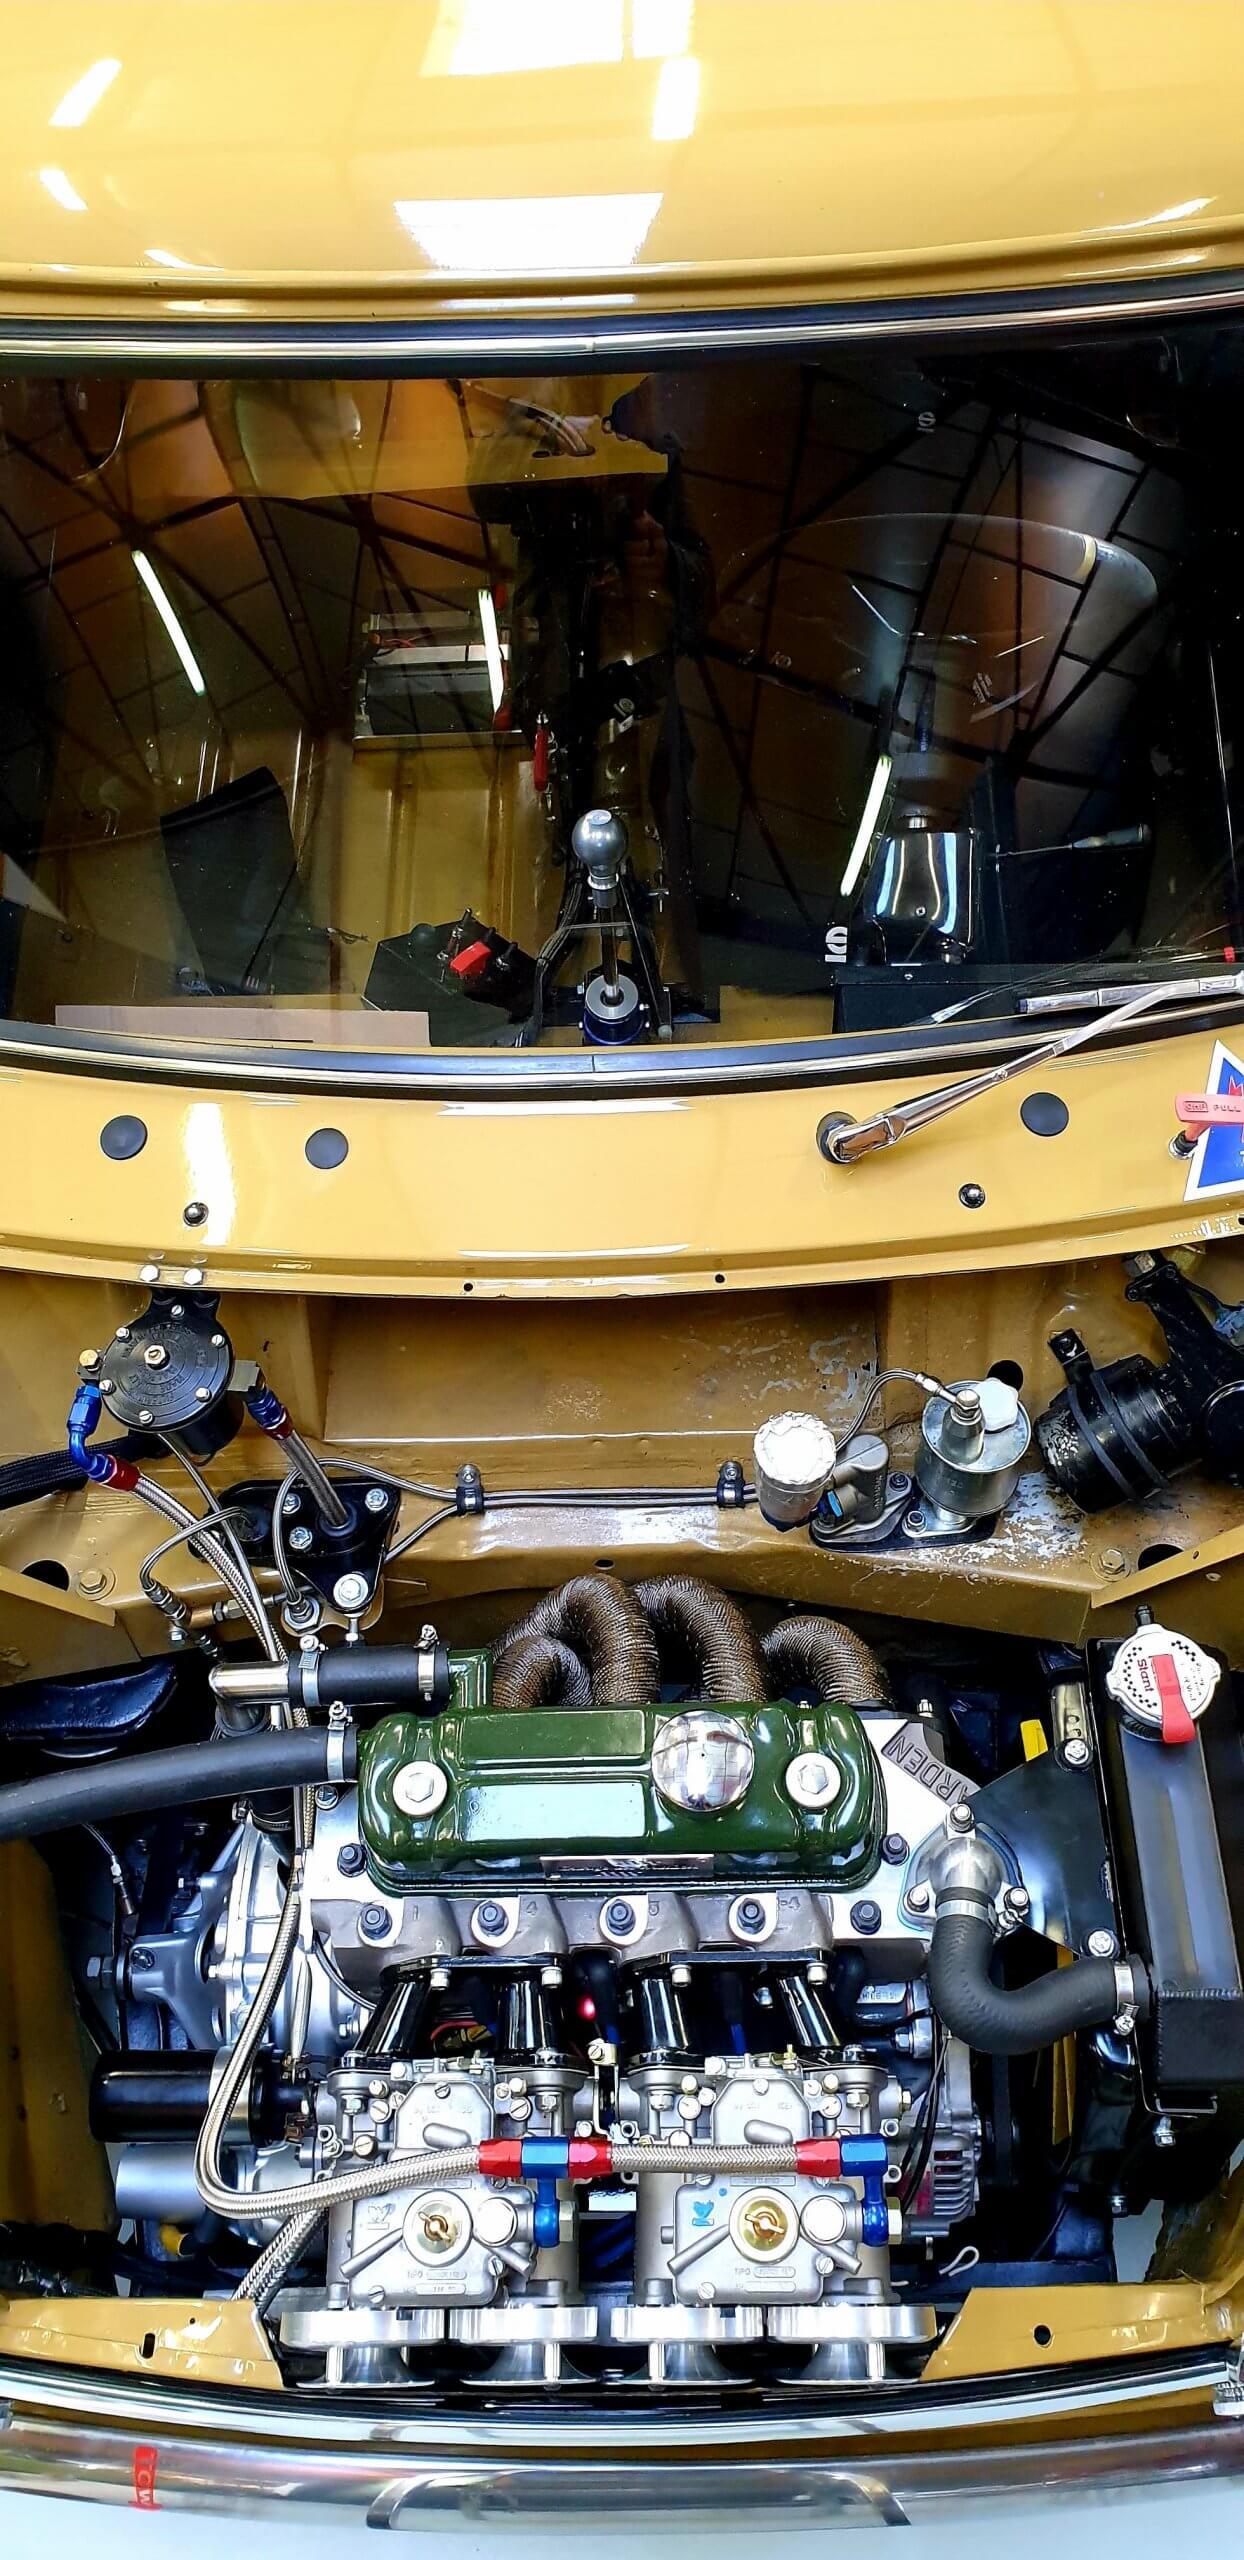 Mini Austin MK2 au Garage des Damiers - Culasse Arden old british car